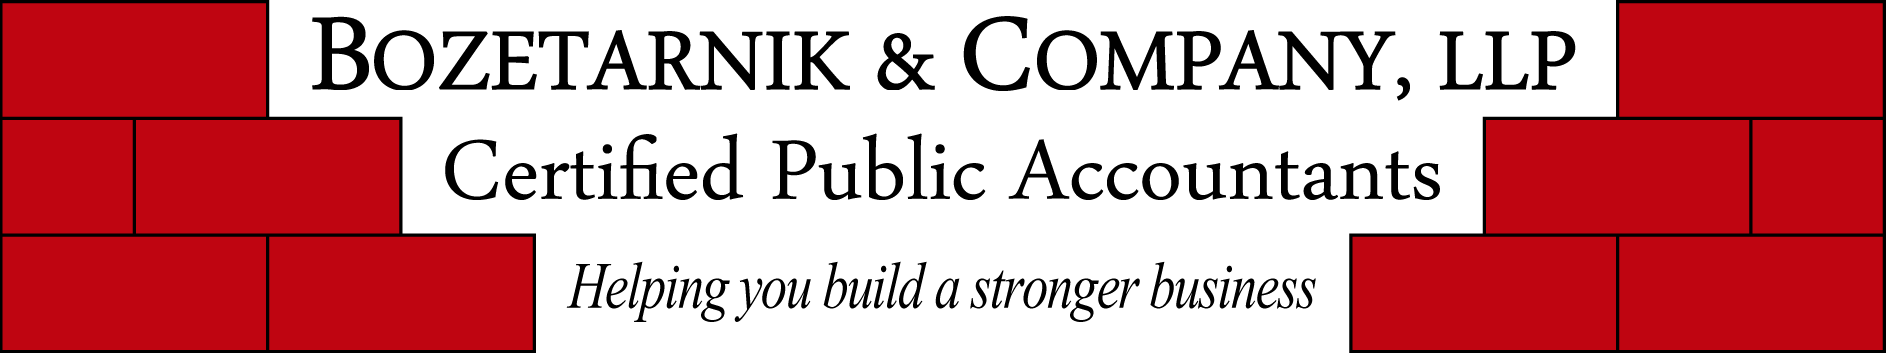 bozetarnik_company_logo_web_large.png